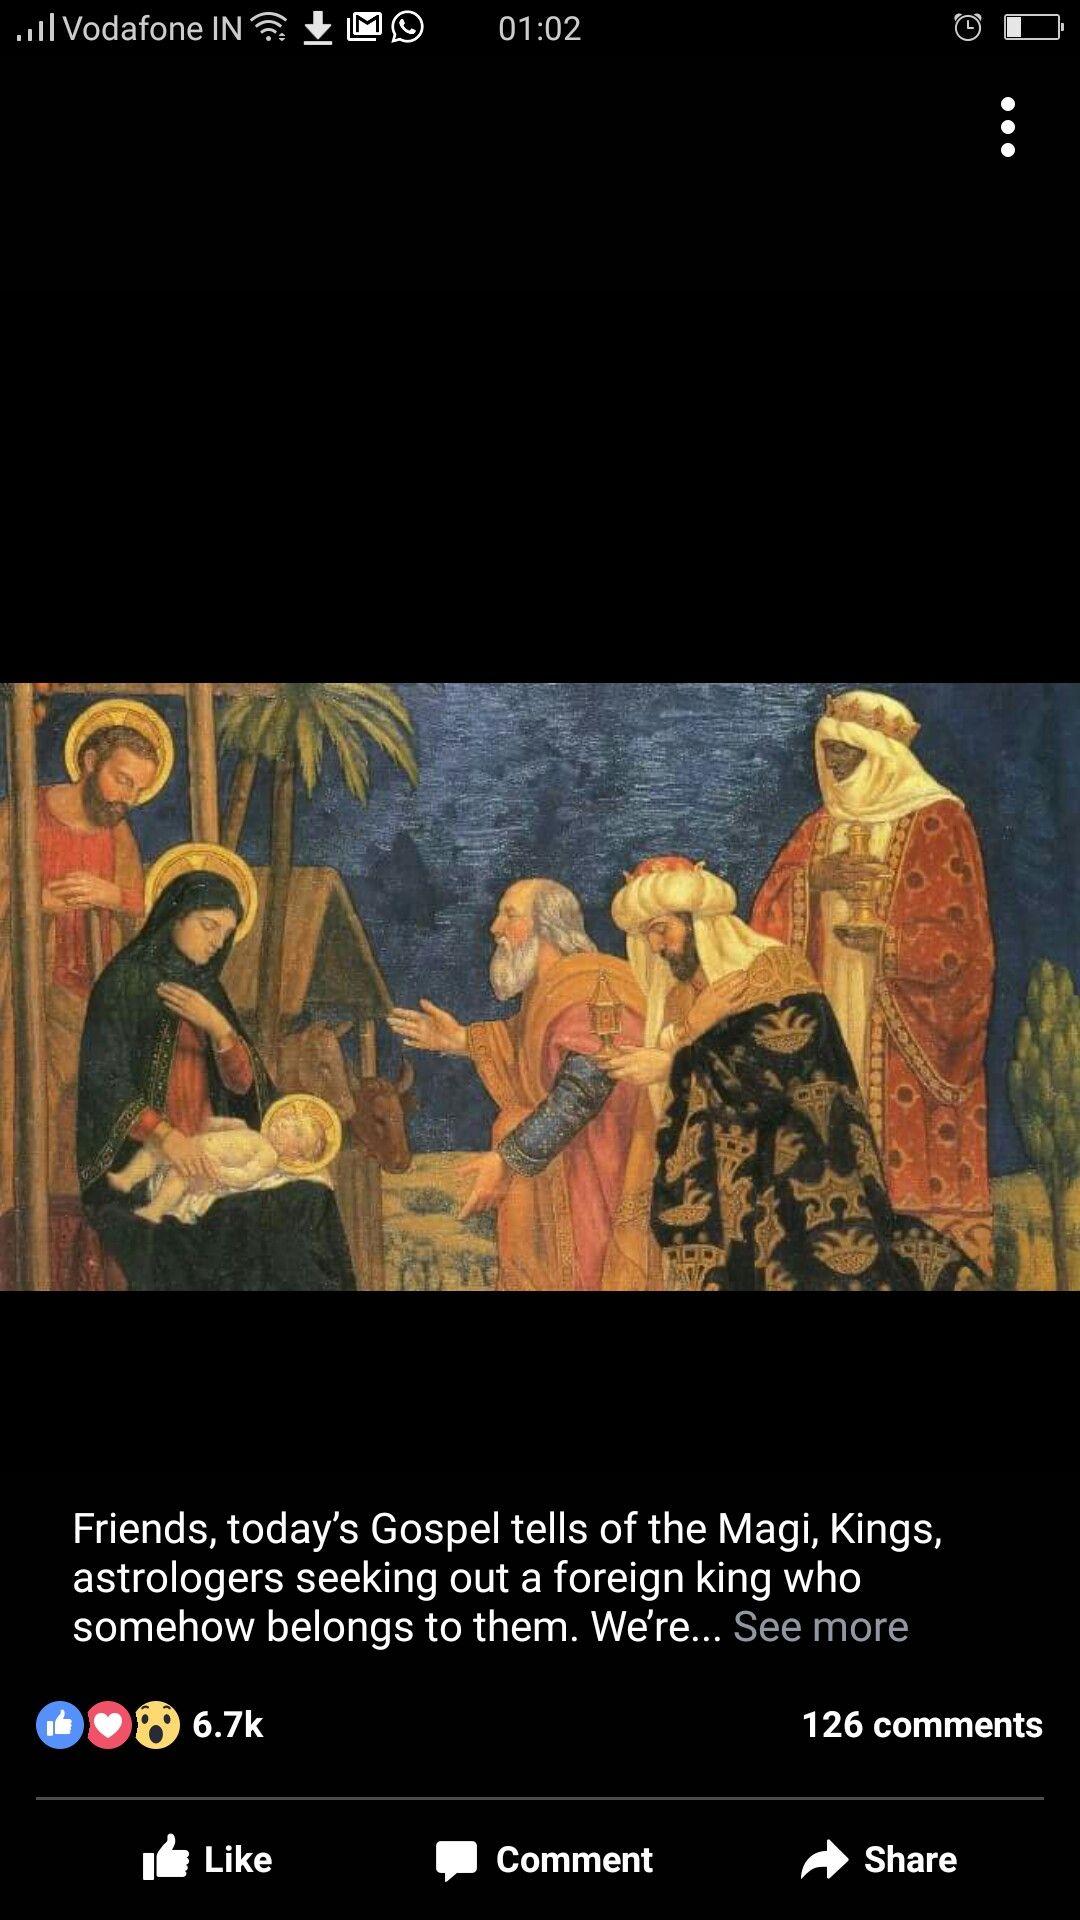 Pin von Savio auf Advent and Christmas | Pinterest